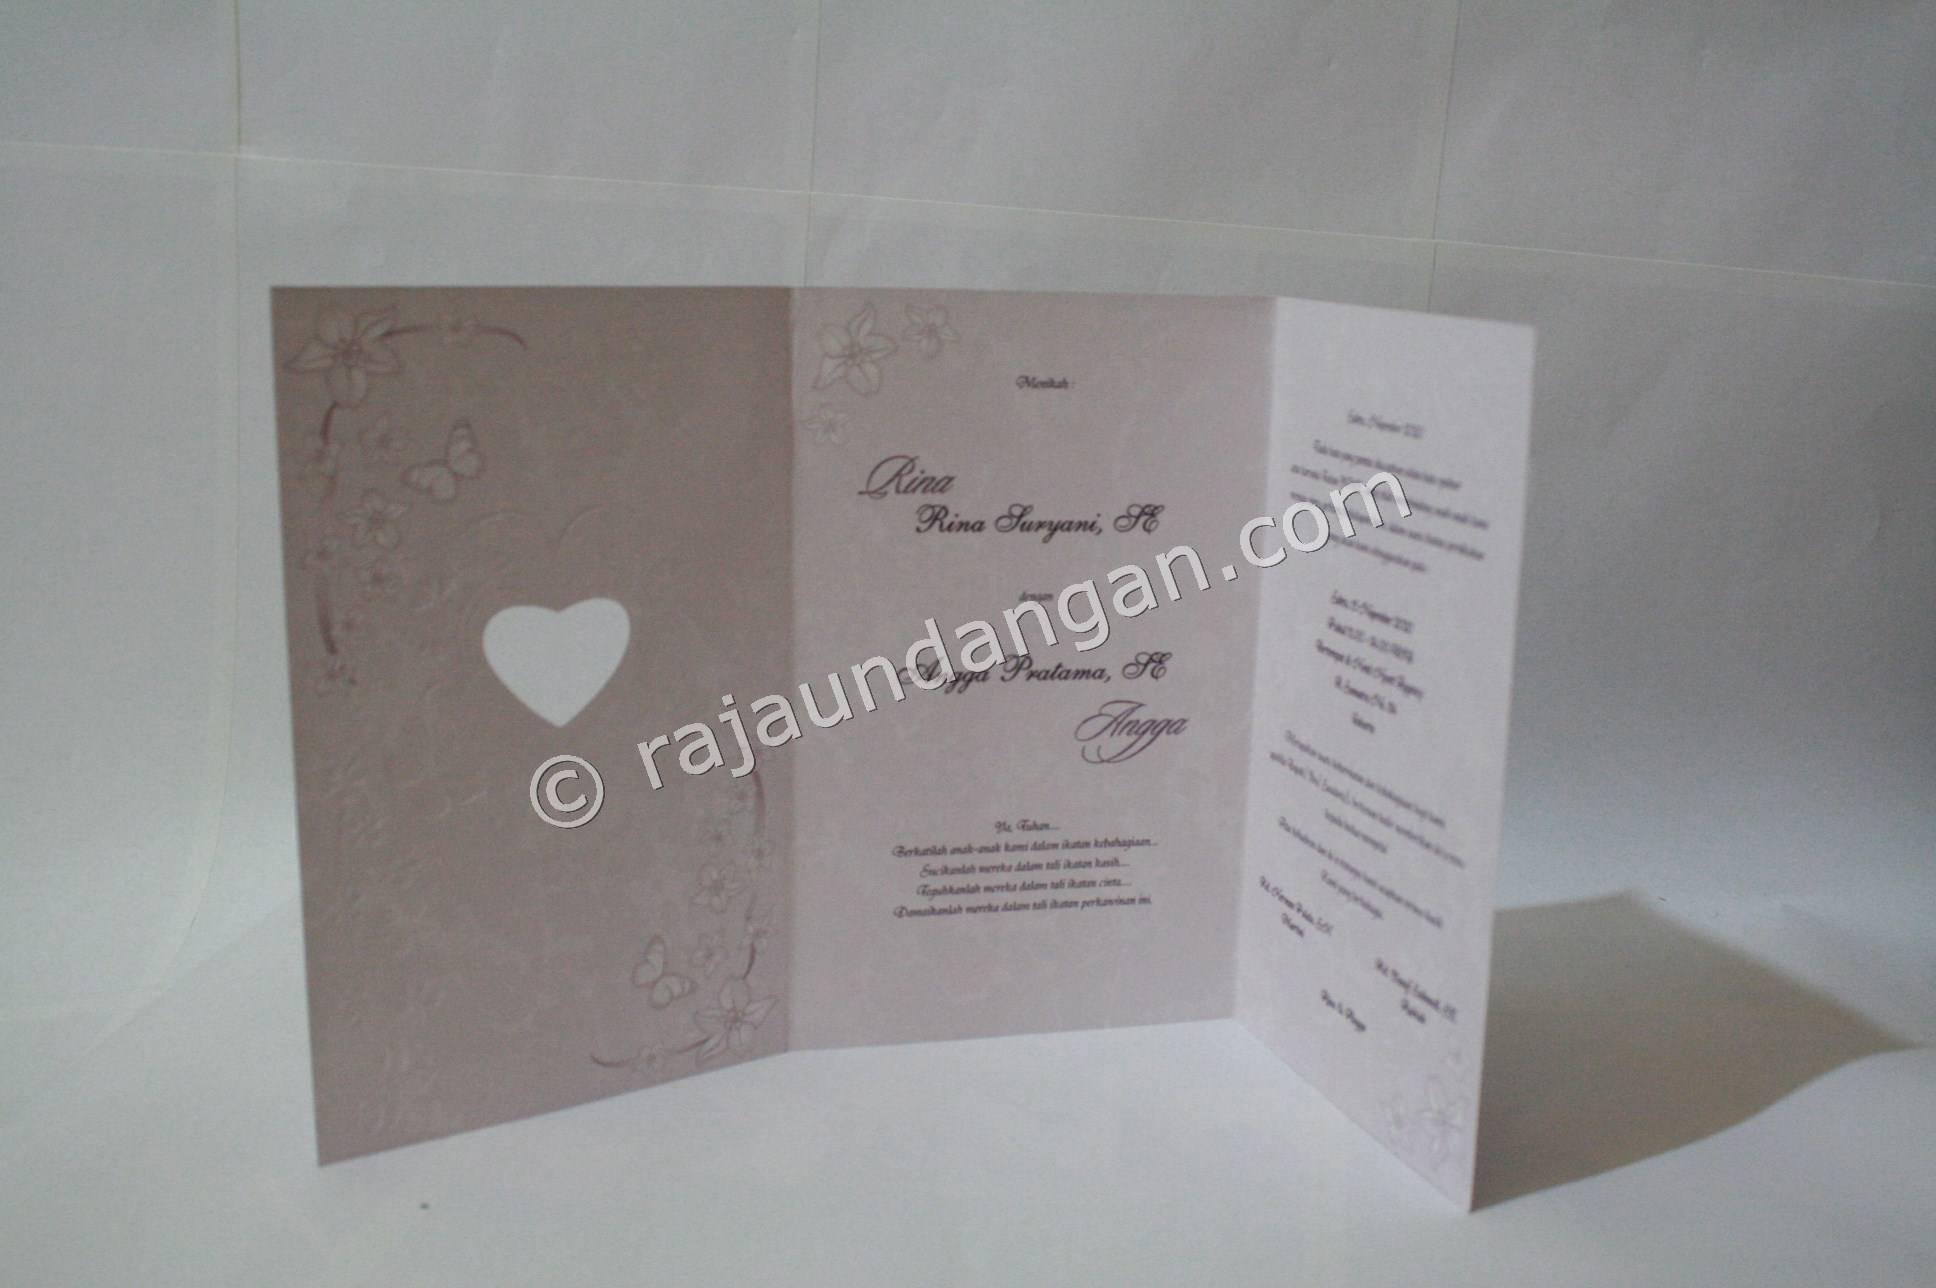 Undangan Pernikahan Softcover ED 26 2